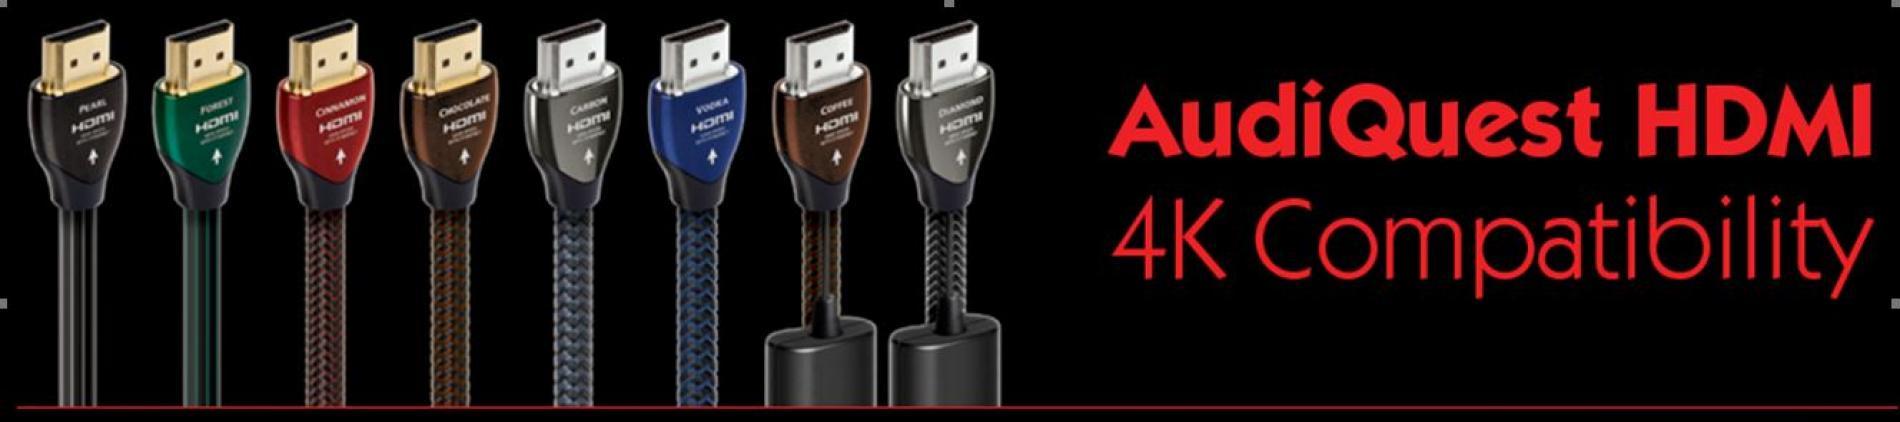 4K tv, 4k HDMI, HDMI cables.